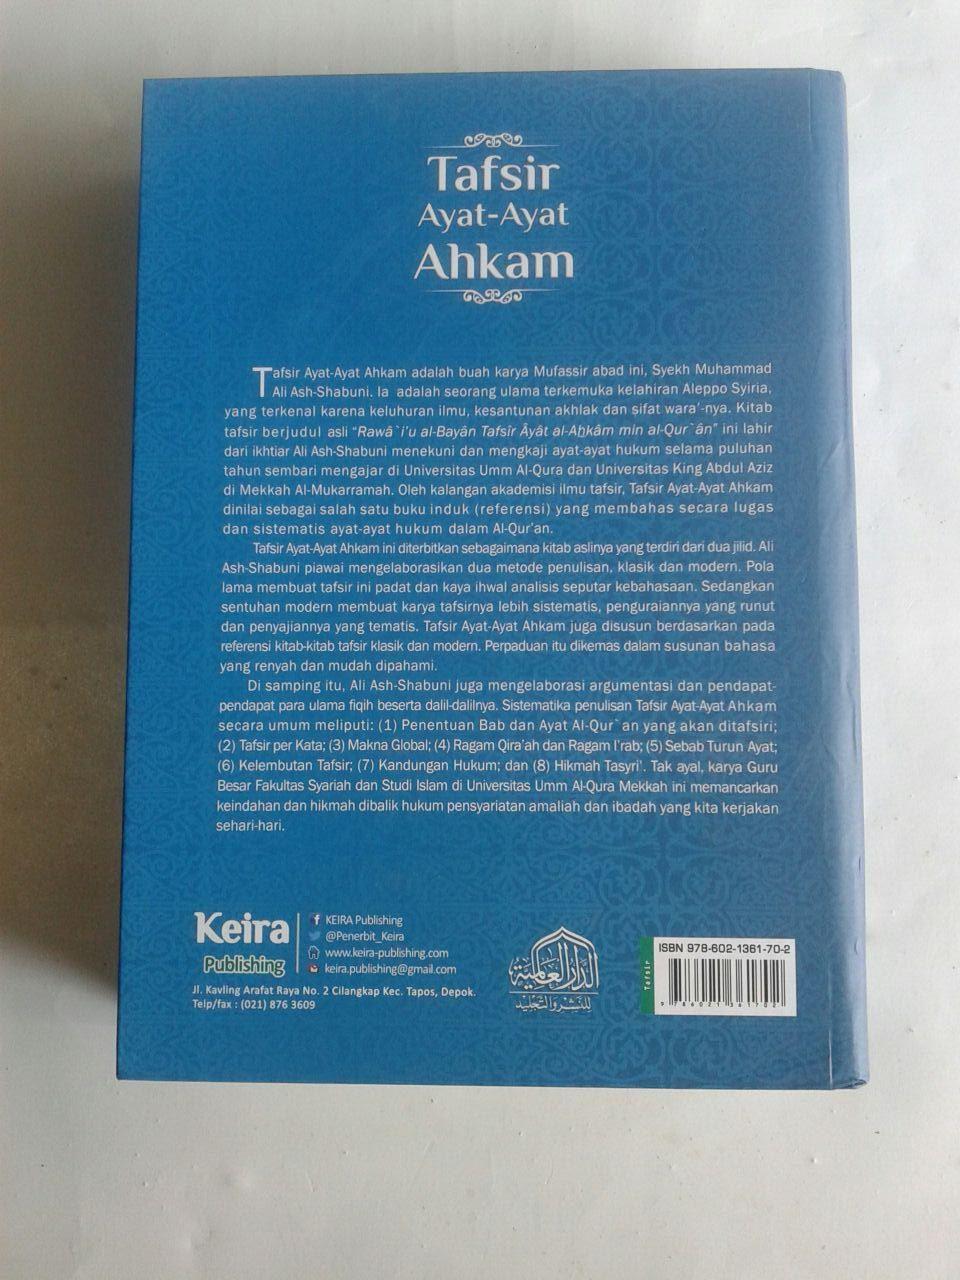 Buku Tafsir Ayat-Ayat Ahkam Jilid 1 cover 3